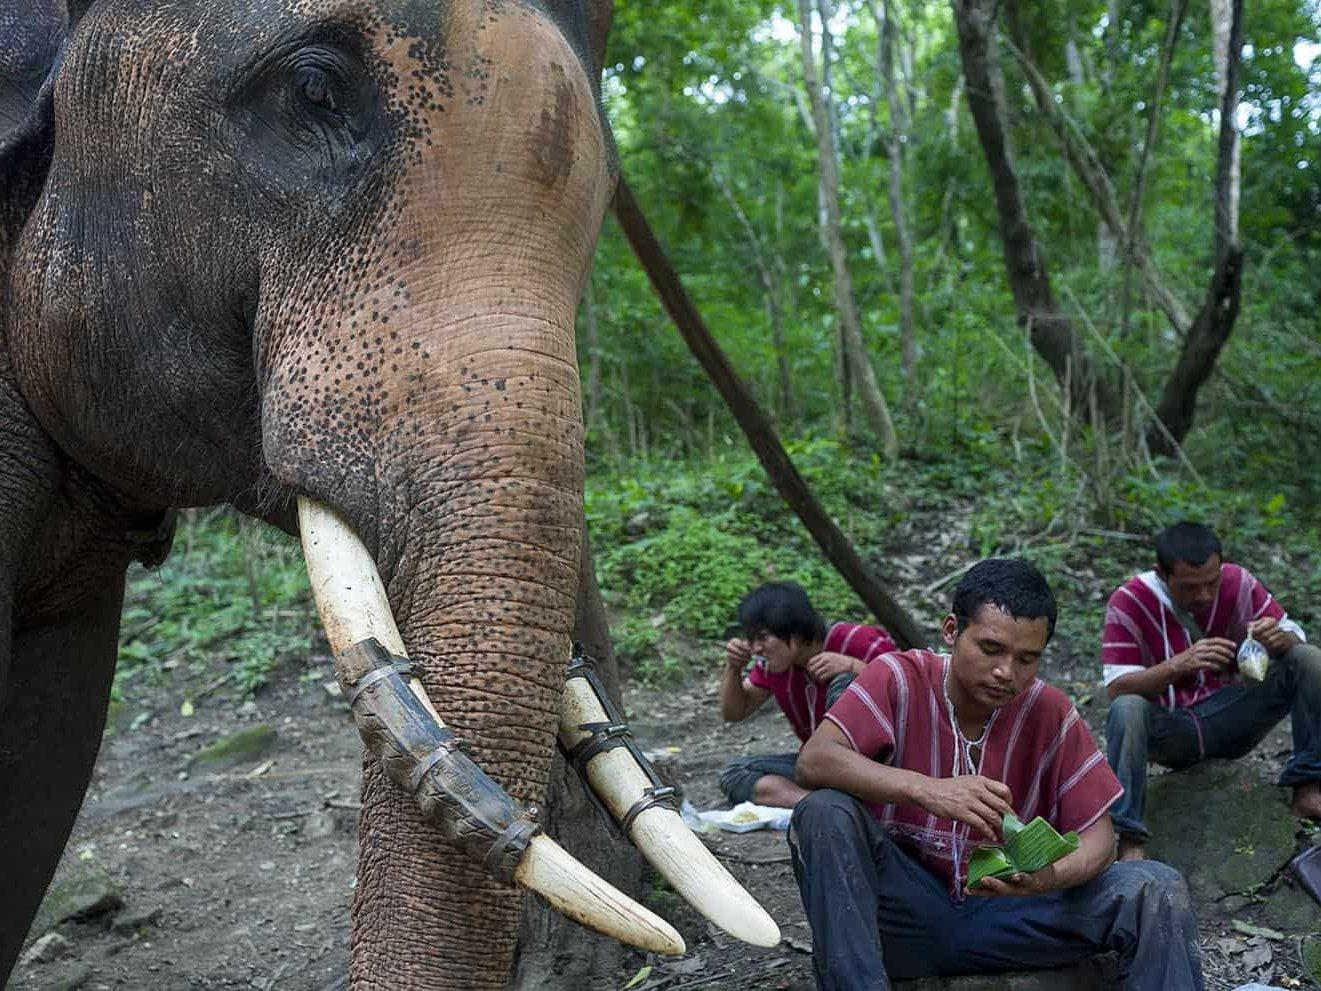 vietnam photographer mahout family binhdang 11